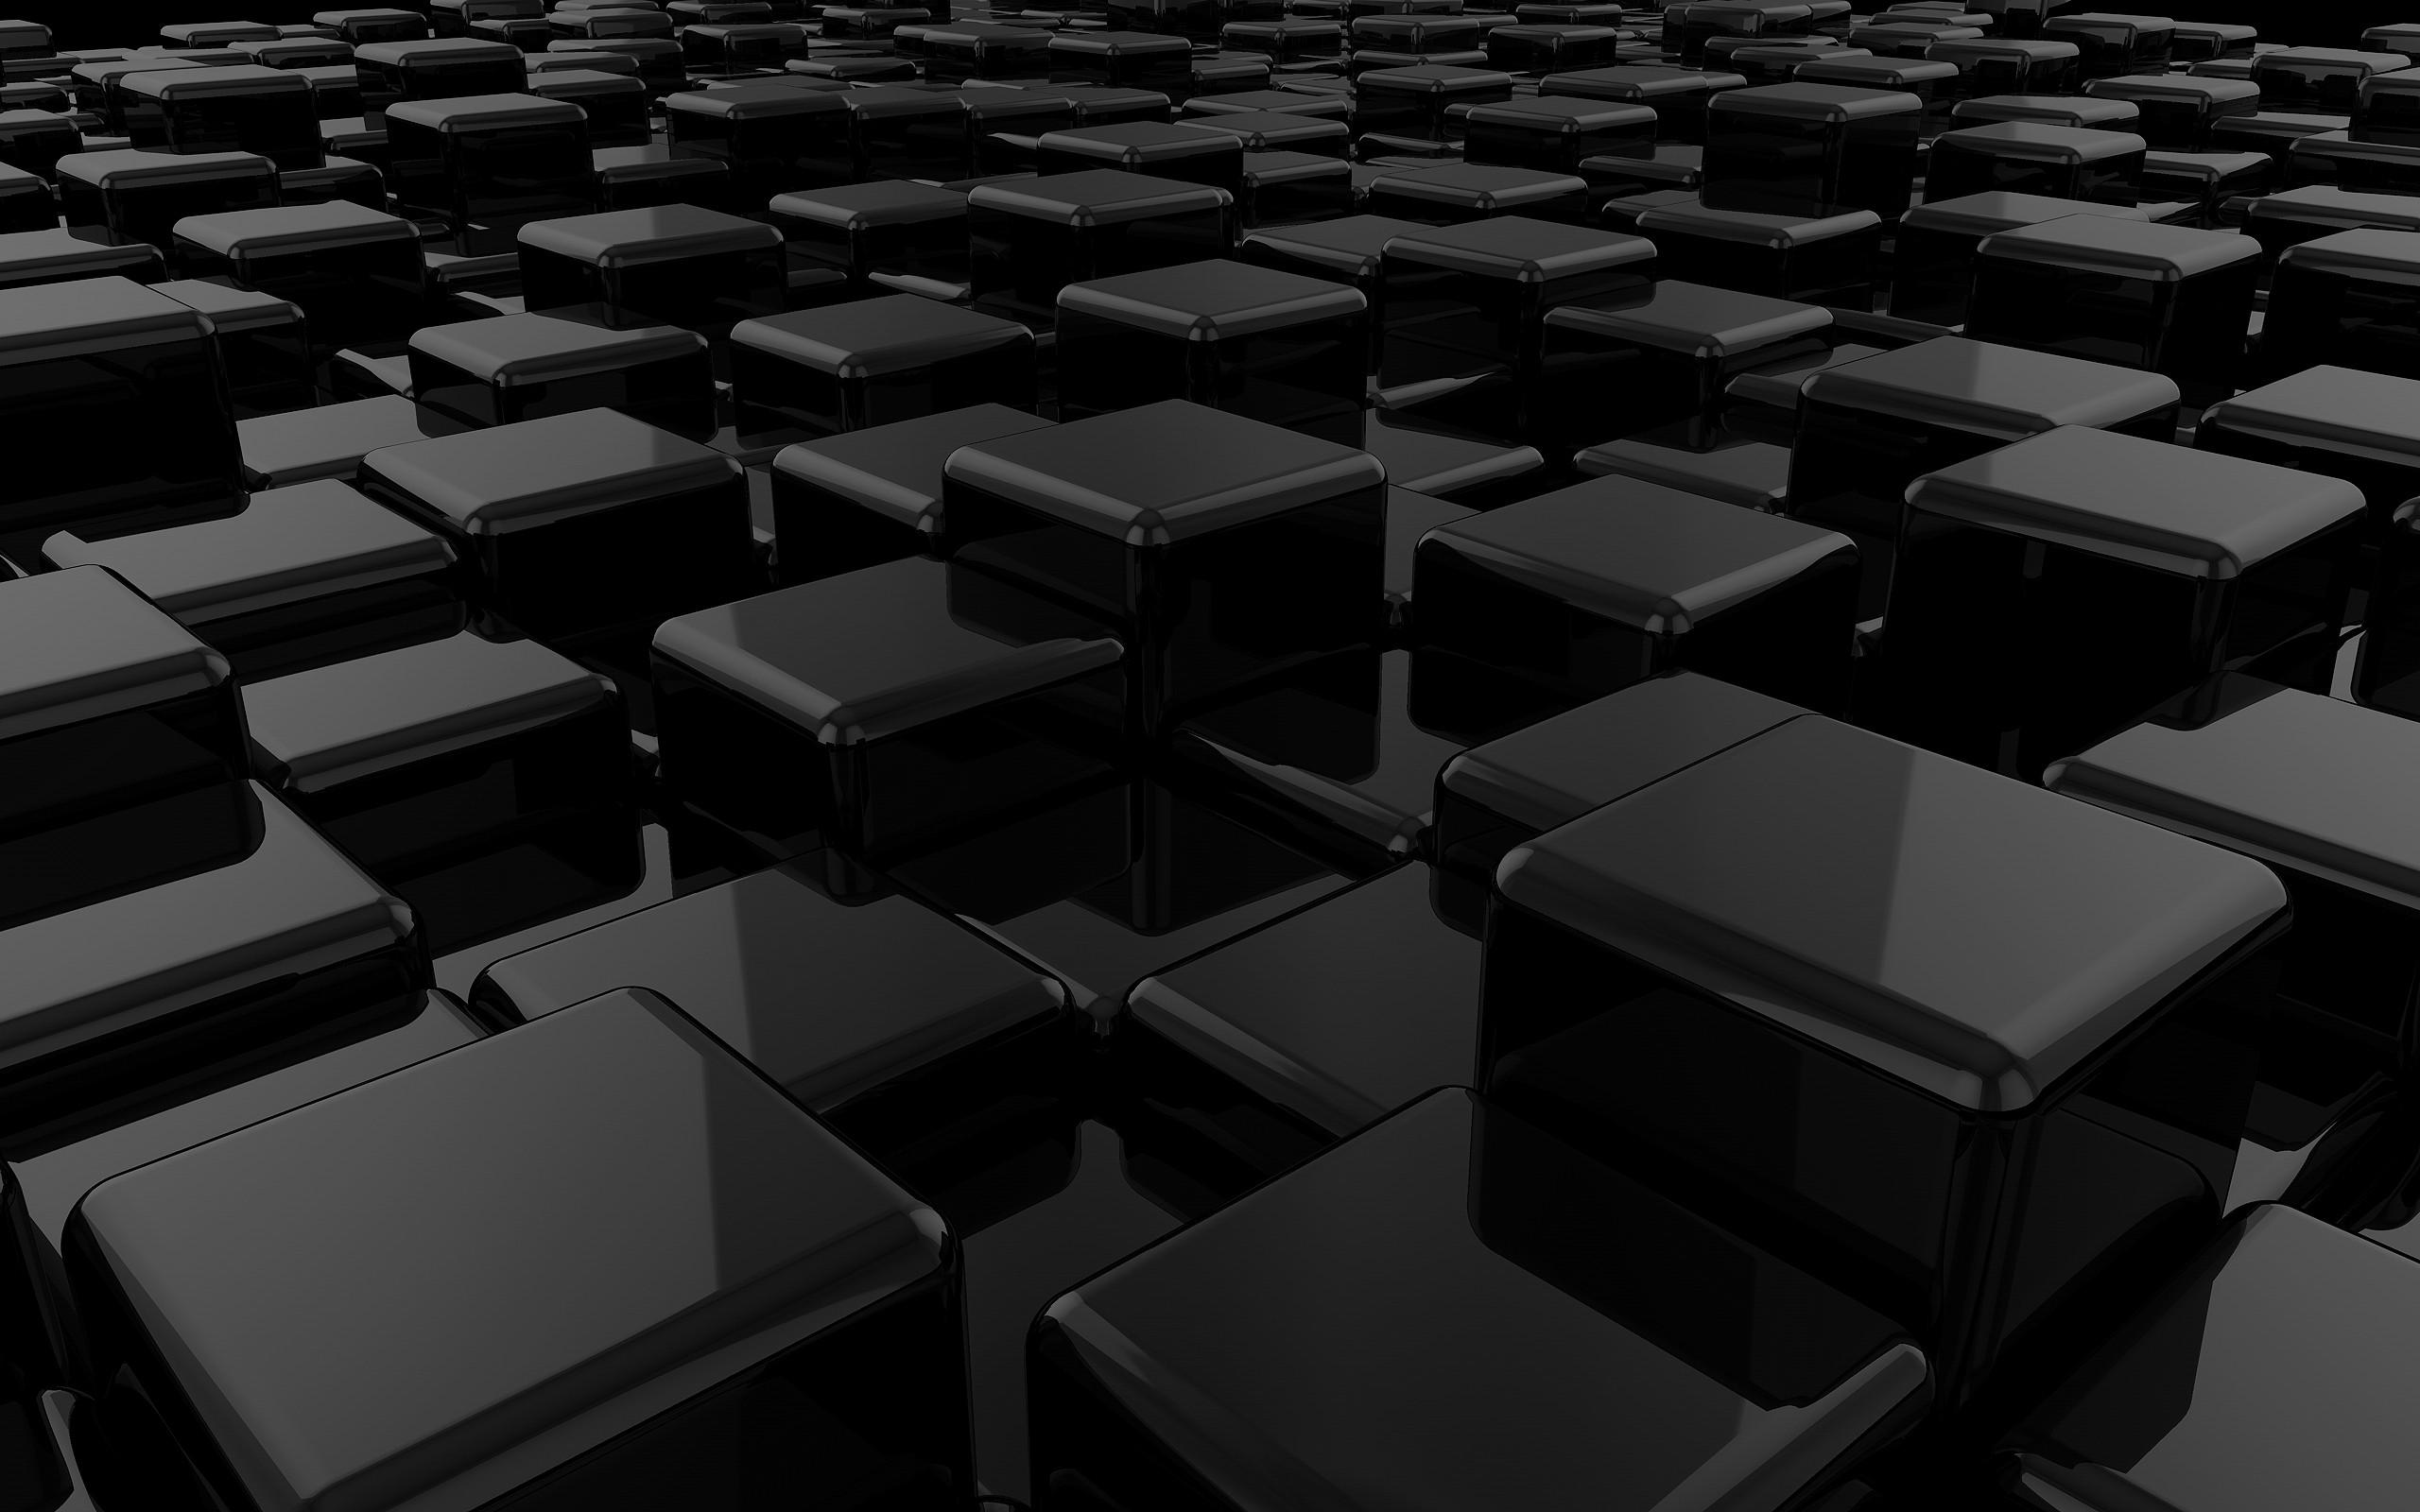 Digital Cube Wallpaper